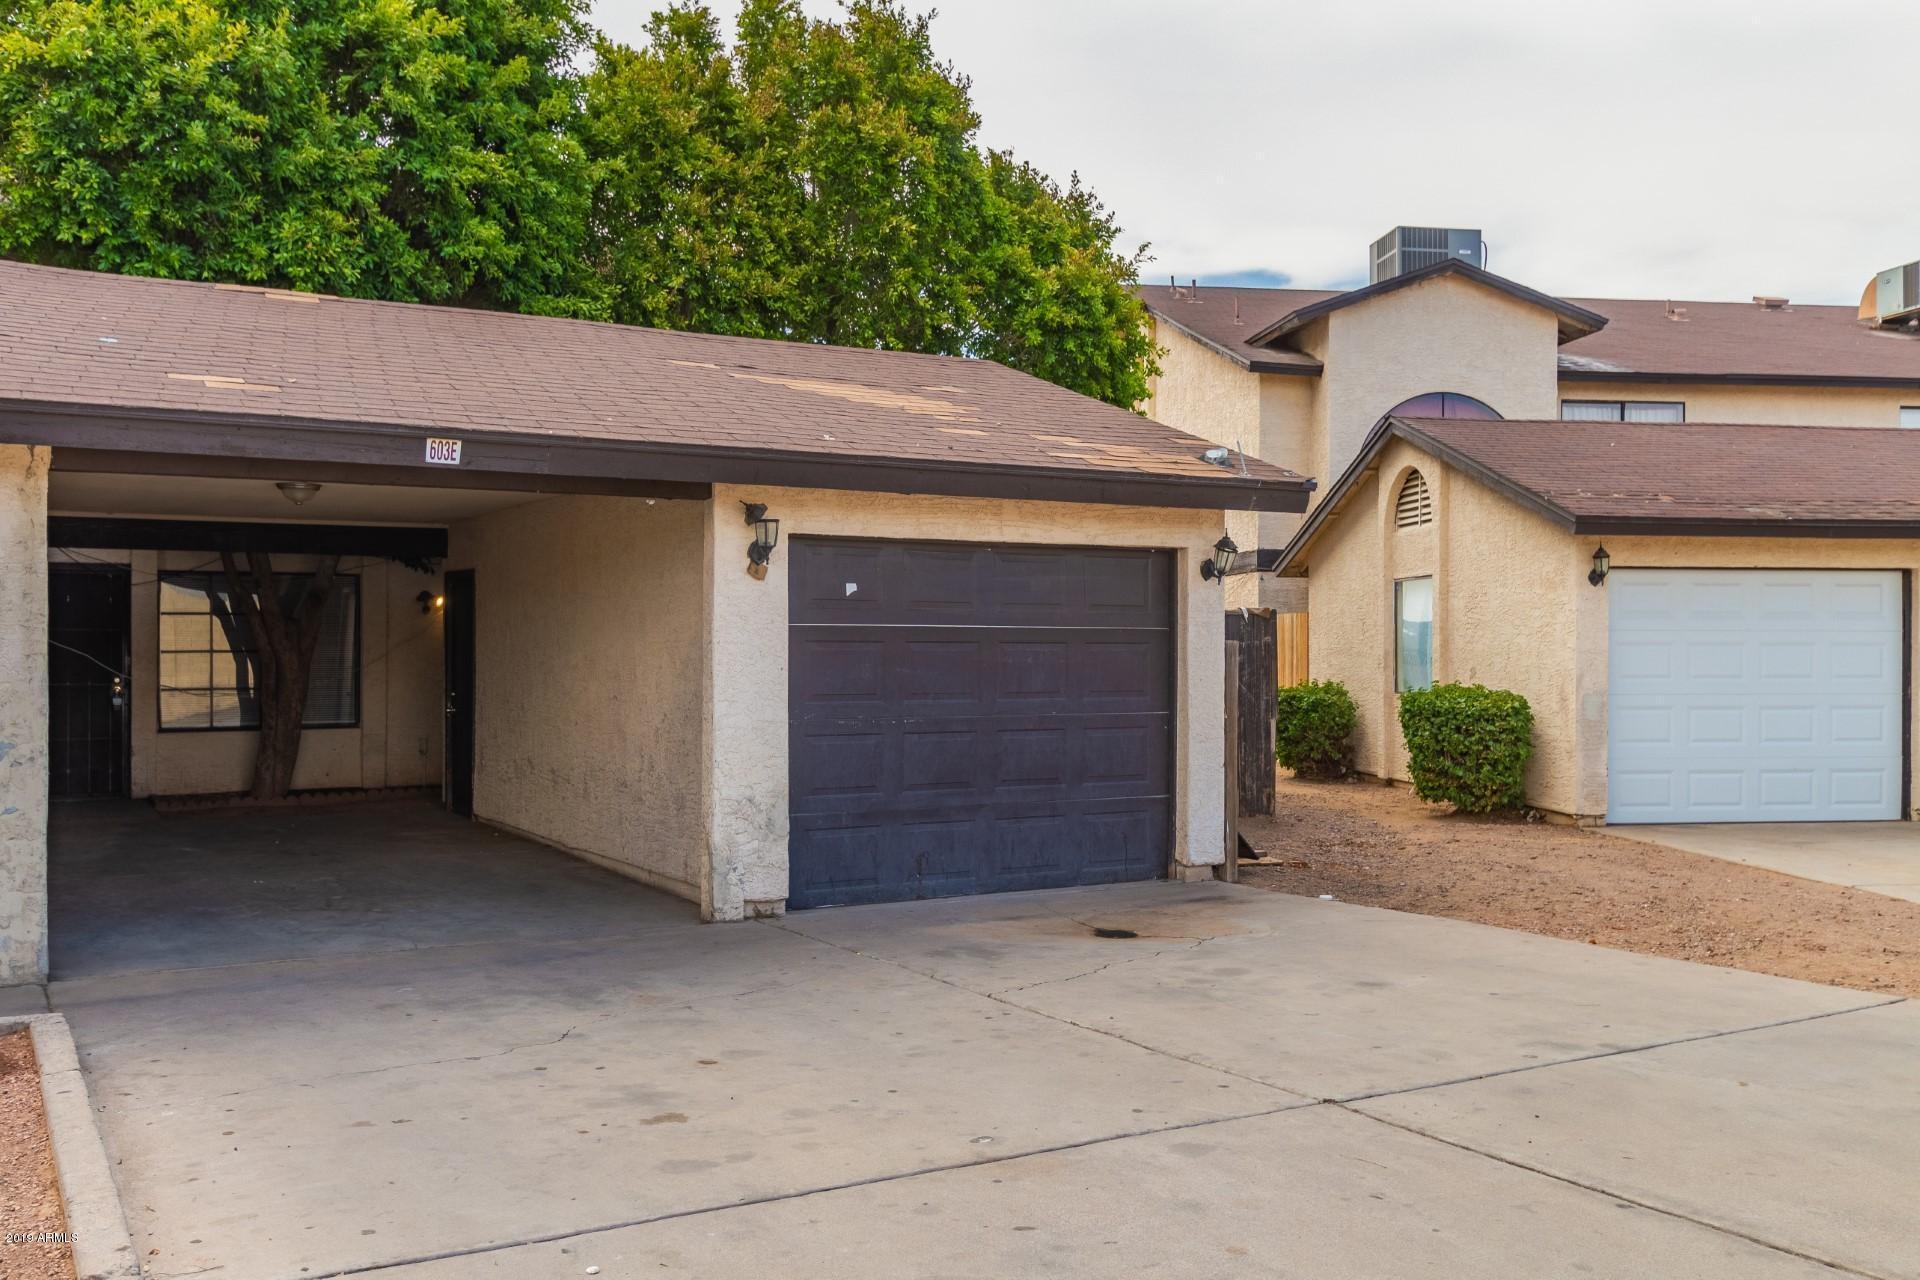 Photo of 603 N 4TH Street #E, Avondale, AZ 85323